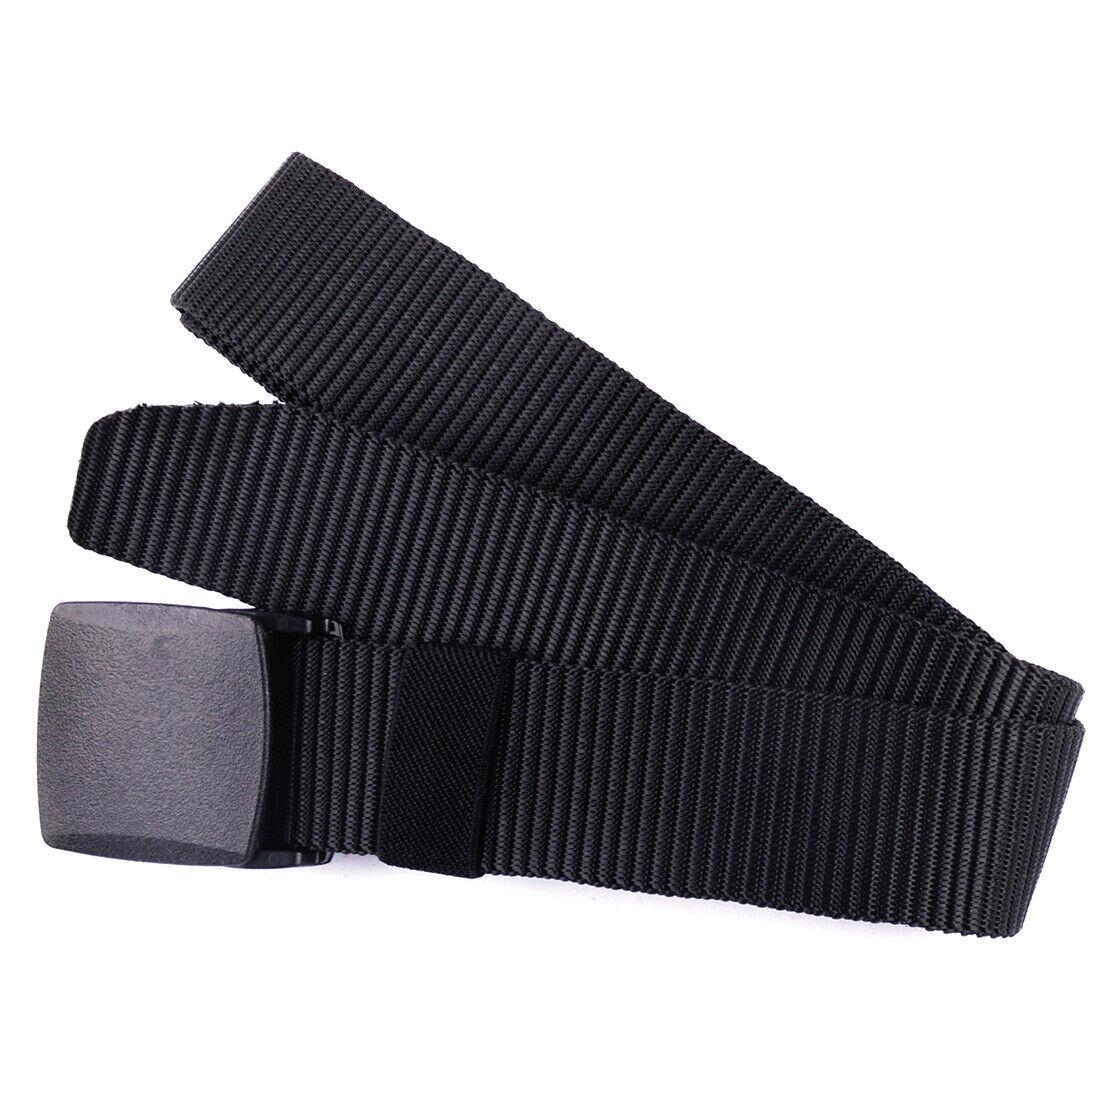 Militär Taktische Gürtel Nylon Band Canvas Belt Strap Automatik Taillengürtel At